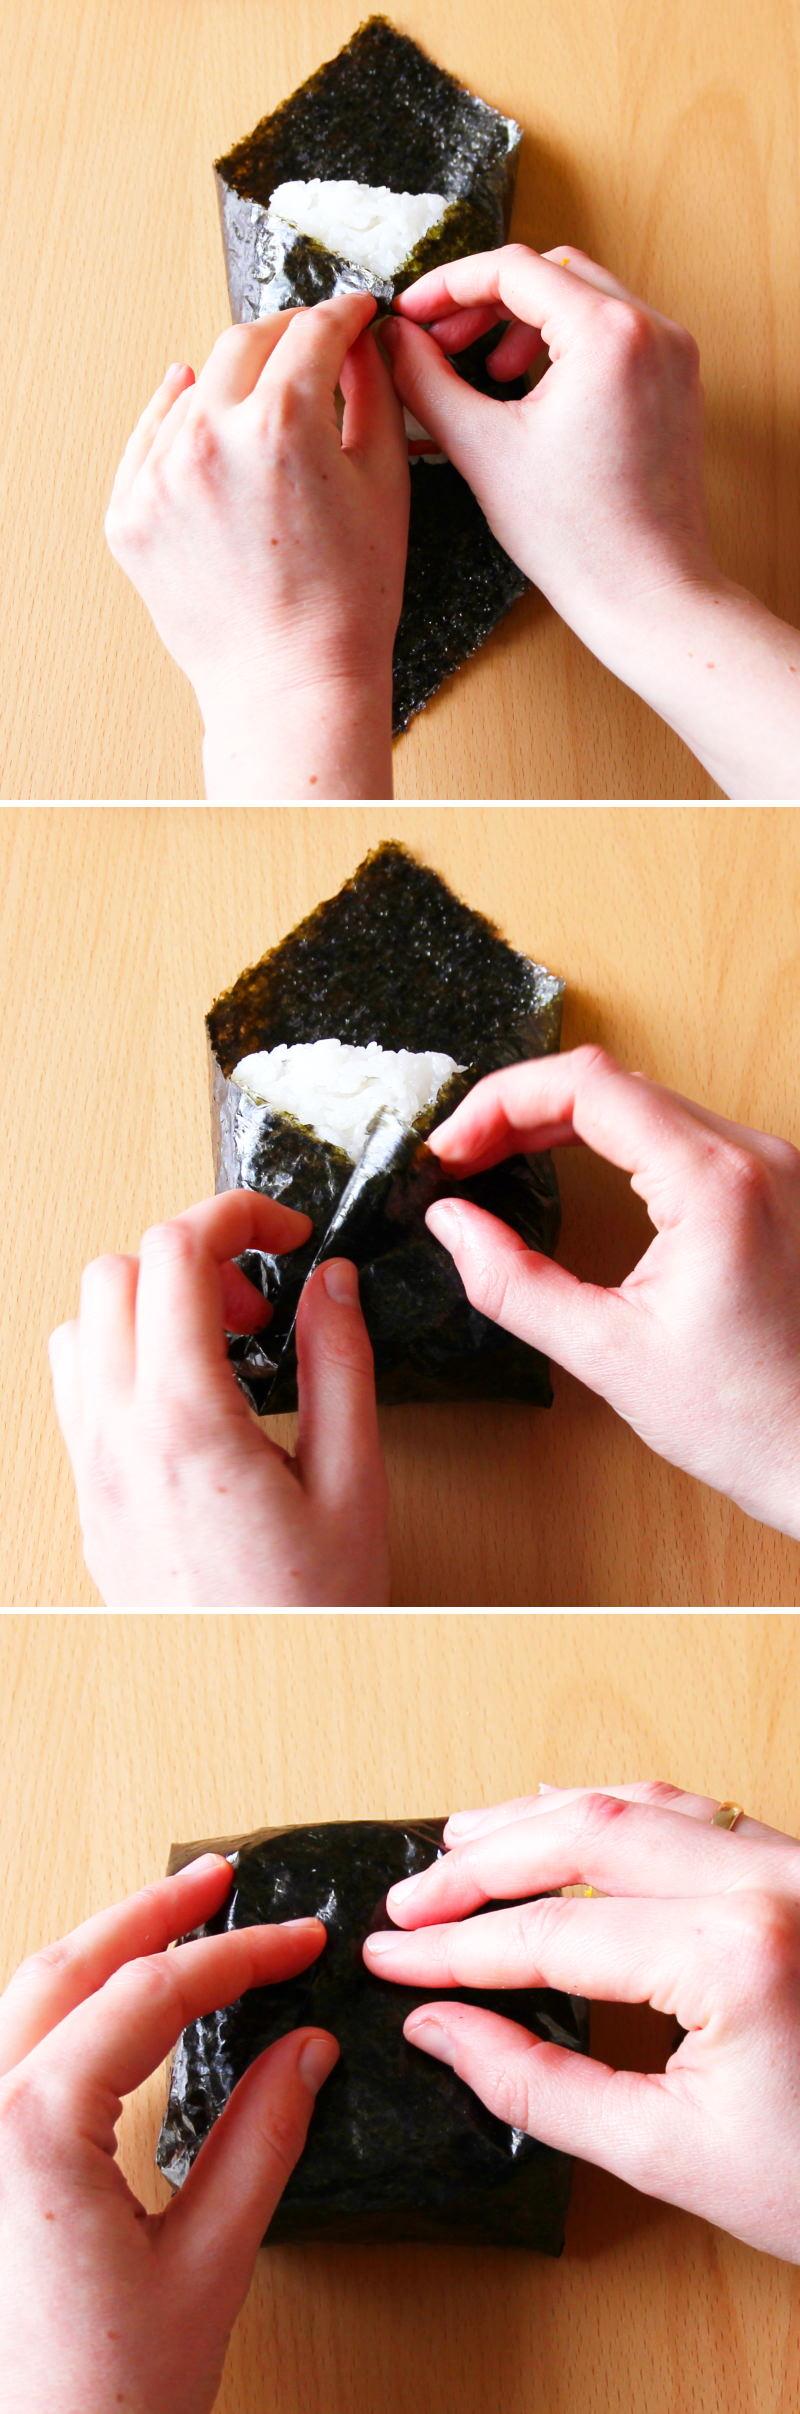 Onigirazu Sushi Sandwich Schritt 5 Nori umwickeln